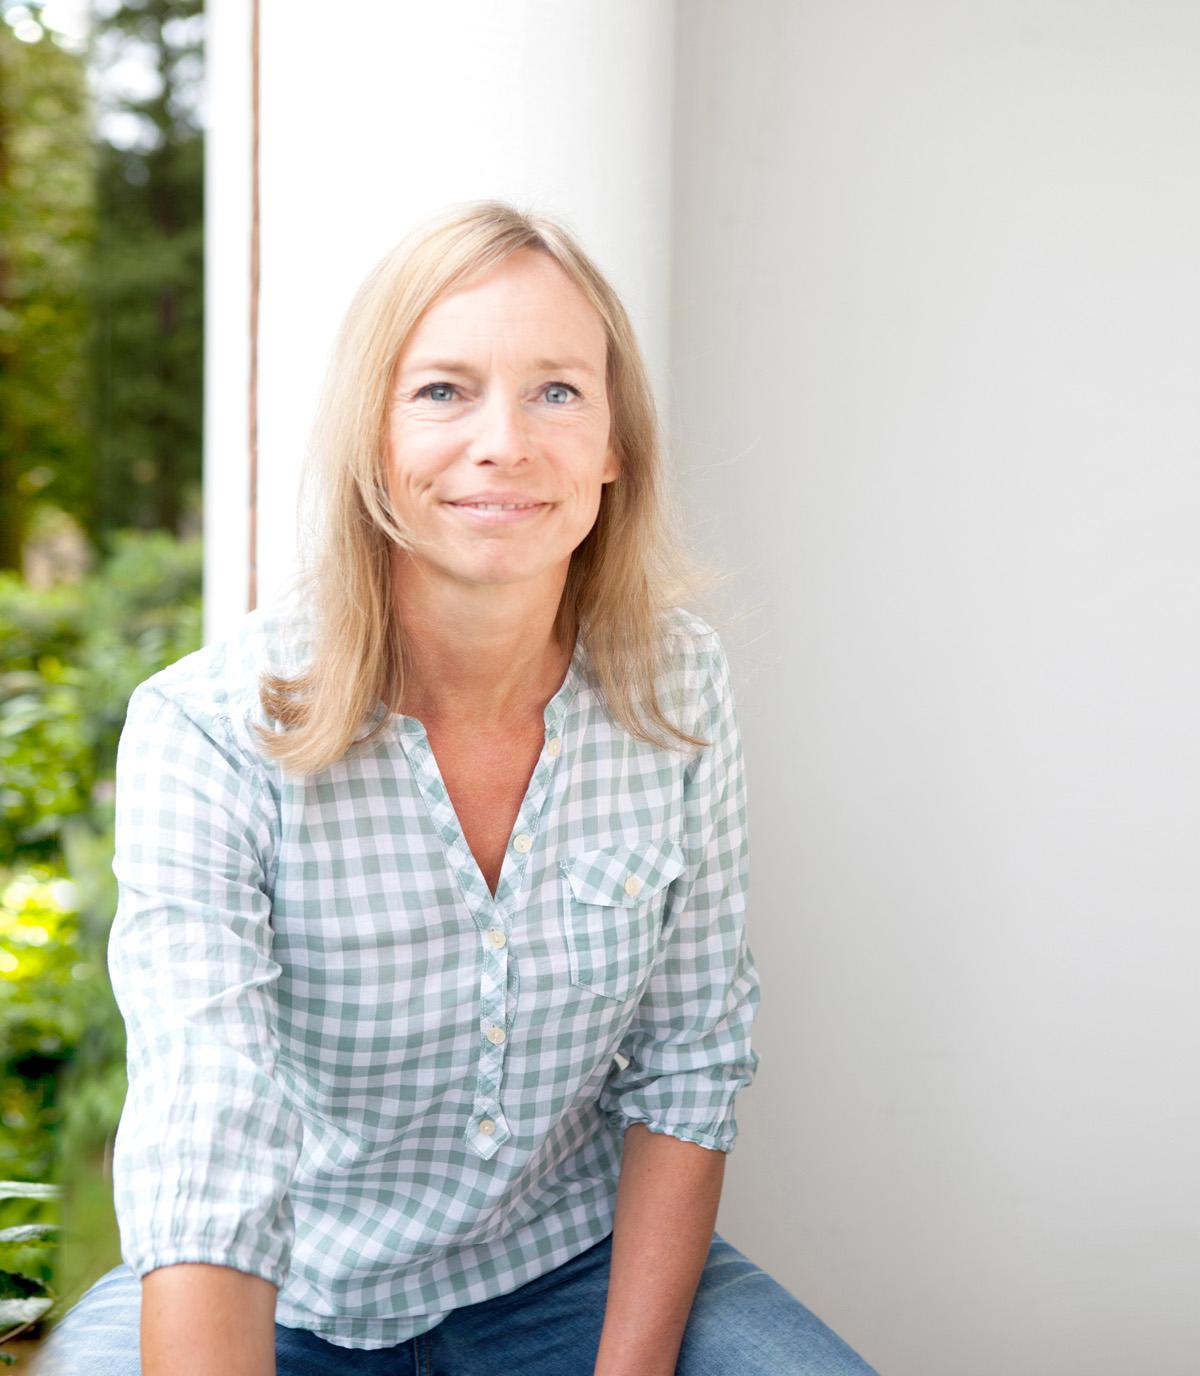 Natascha Schäfer, Geschäftsfüherin